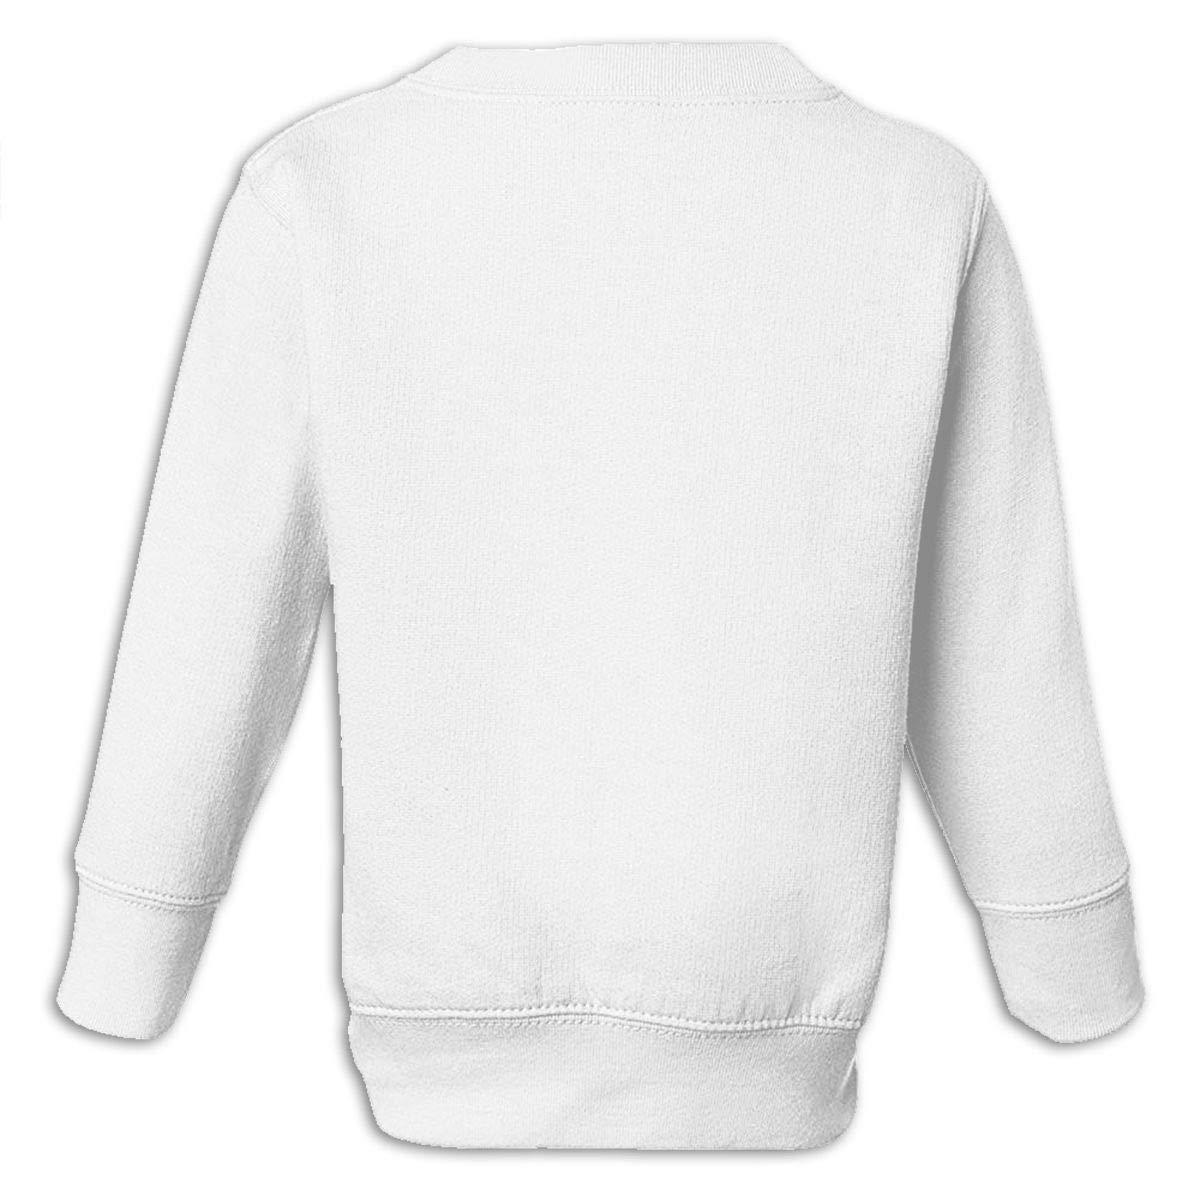 NMDJC CCQ Christmas Funny Santa Claus Baby Sweatshirt Cute Toddler Hoodies Soft Sweaters